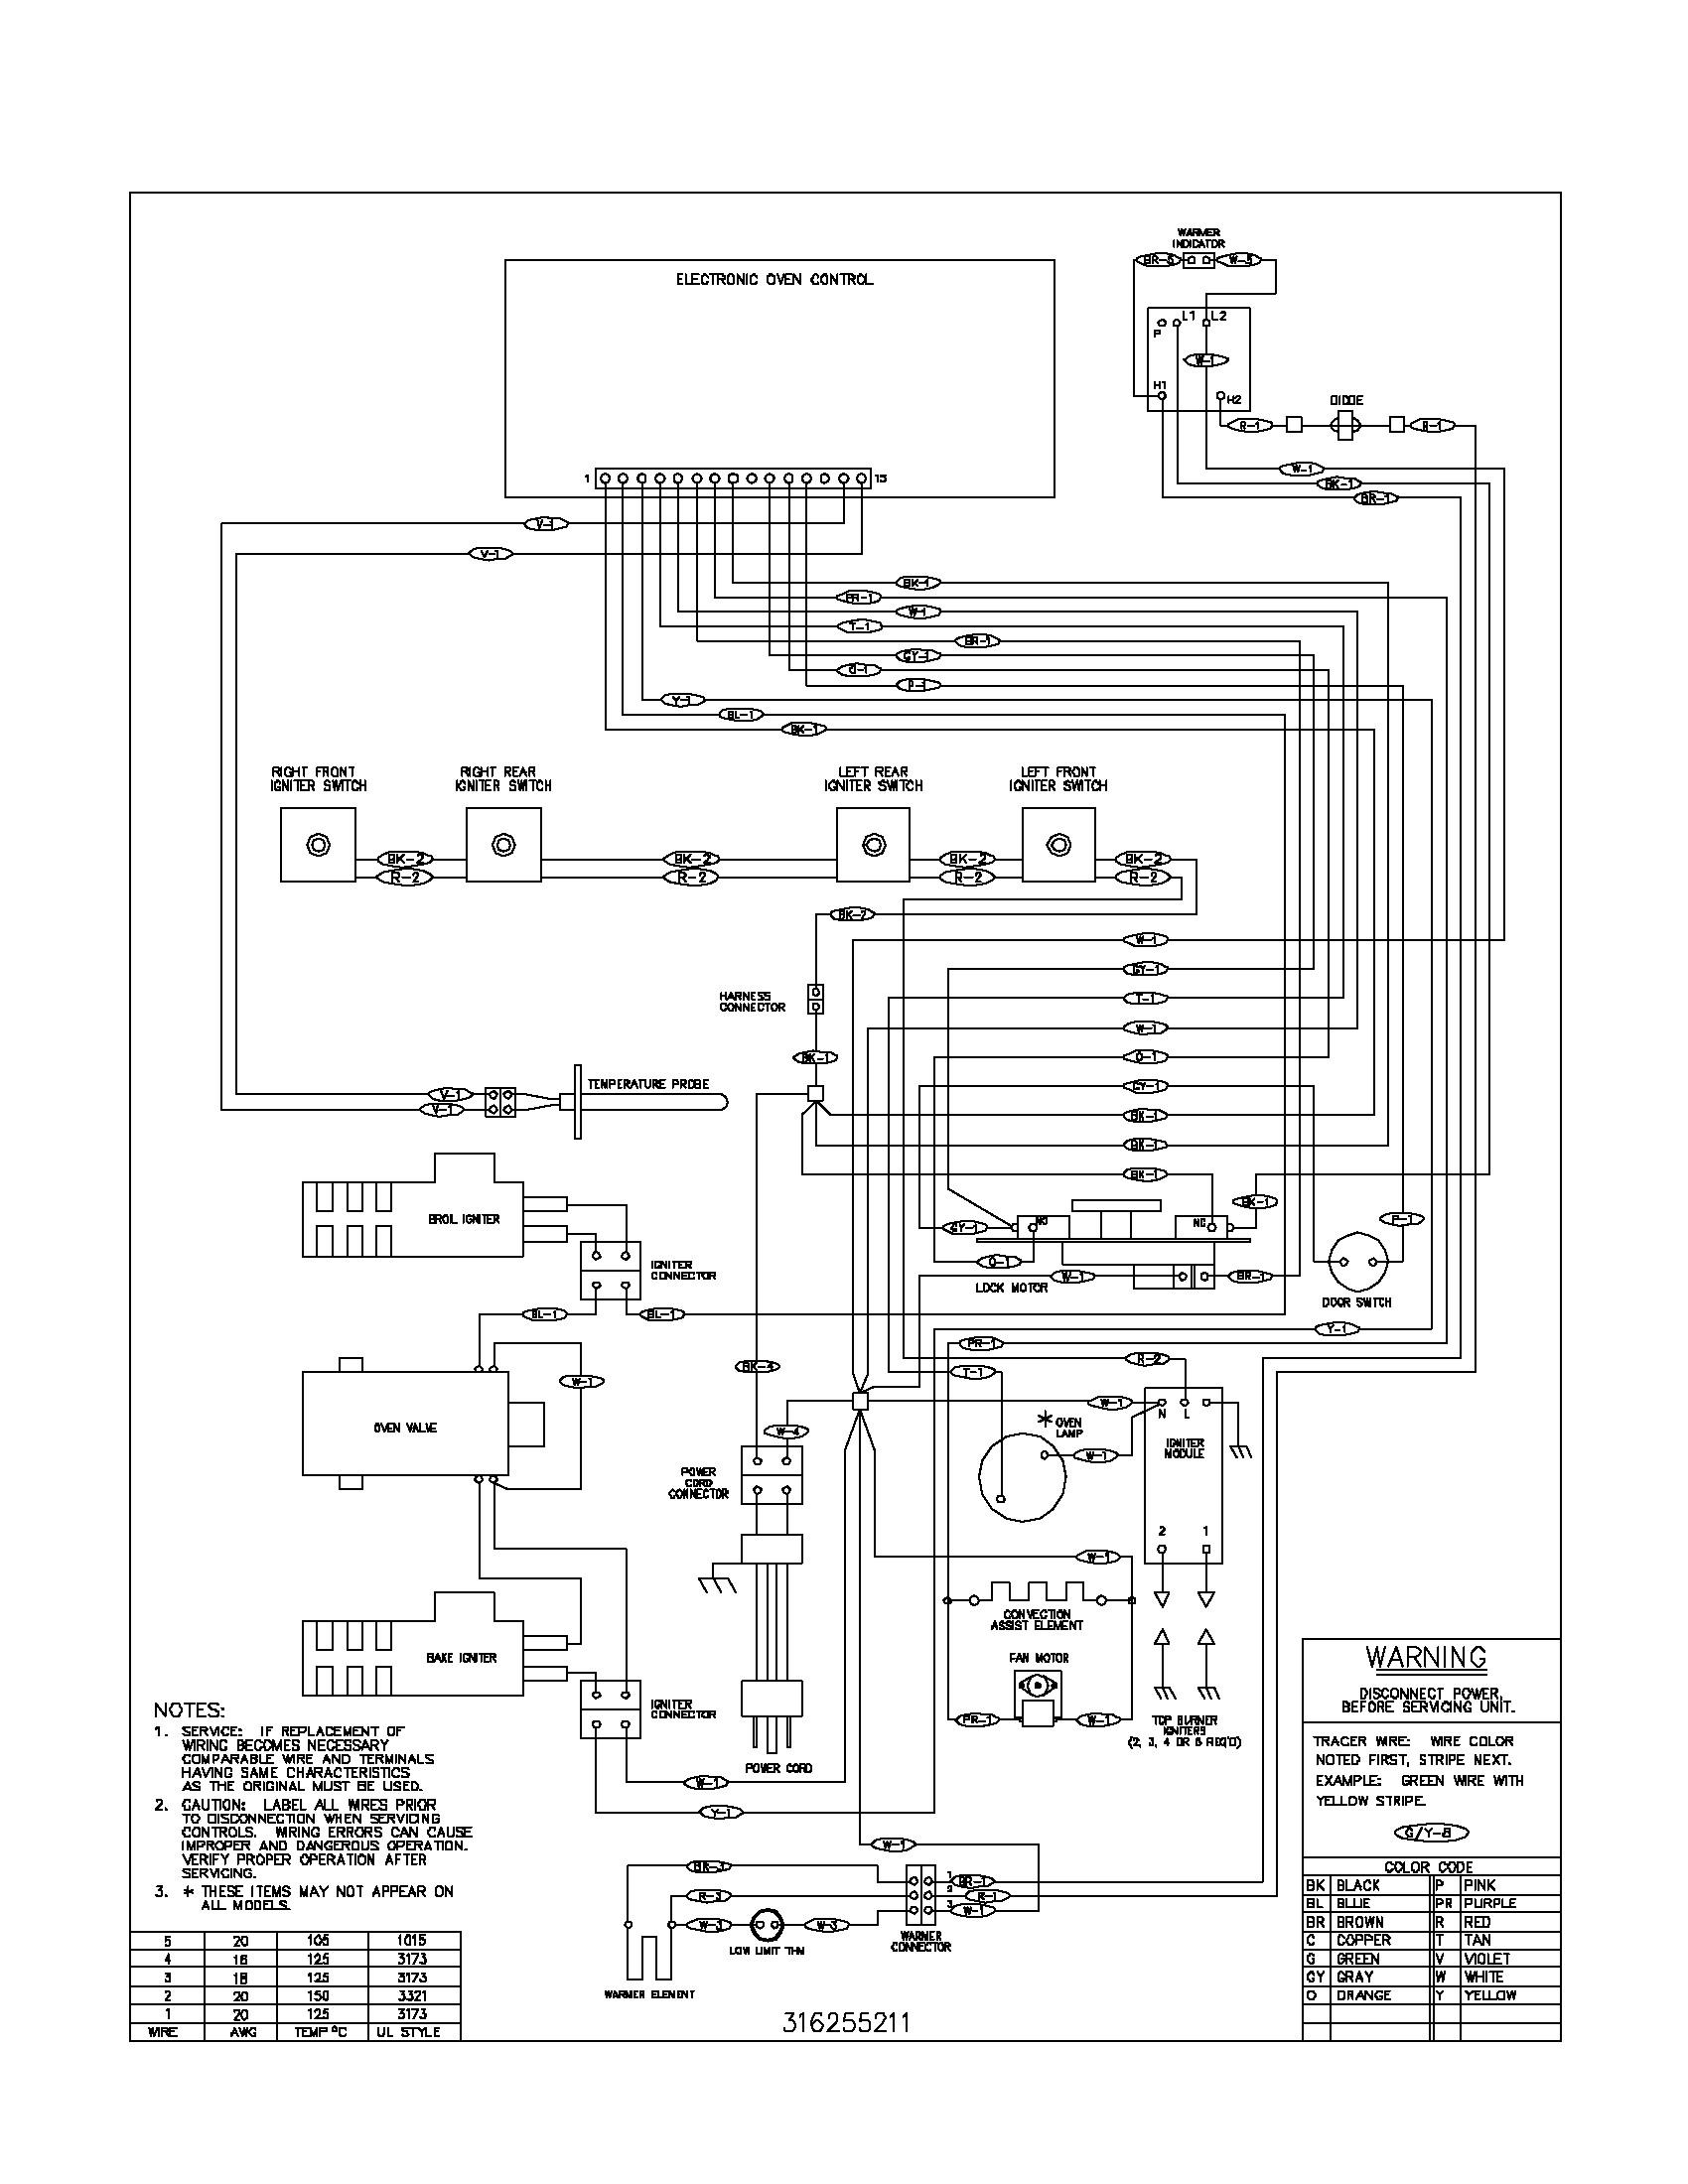 frigidaire refrigerator wiring diagram Download-Wiring Diagram For Frigidaire Refrigerator Wiring Diagram Best Ideas 15-j